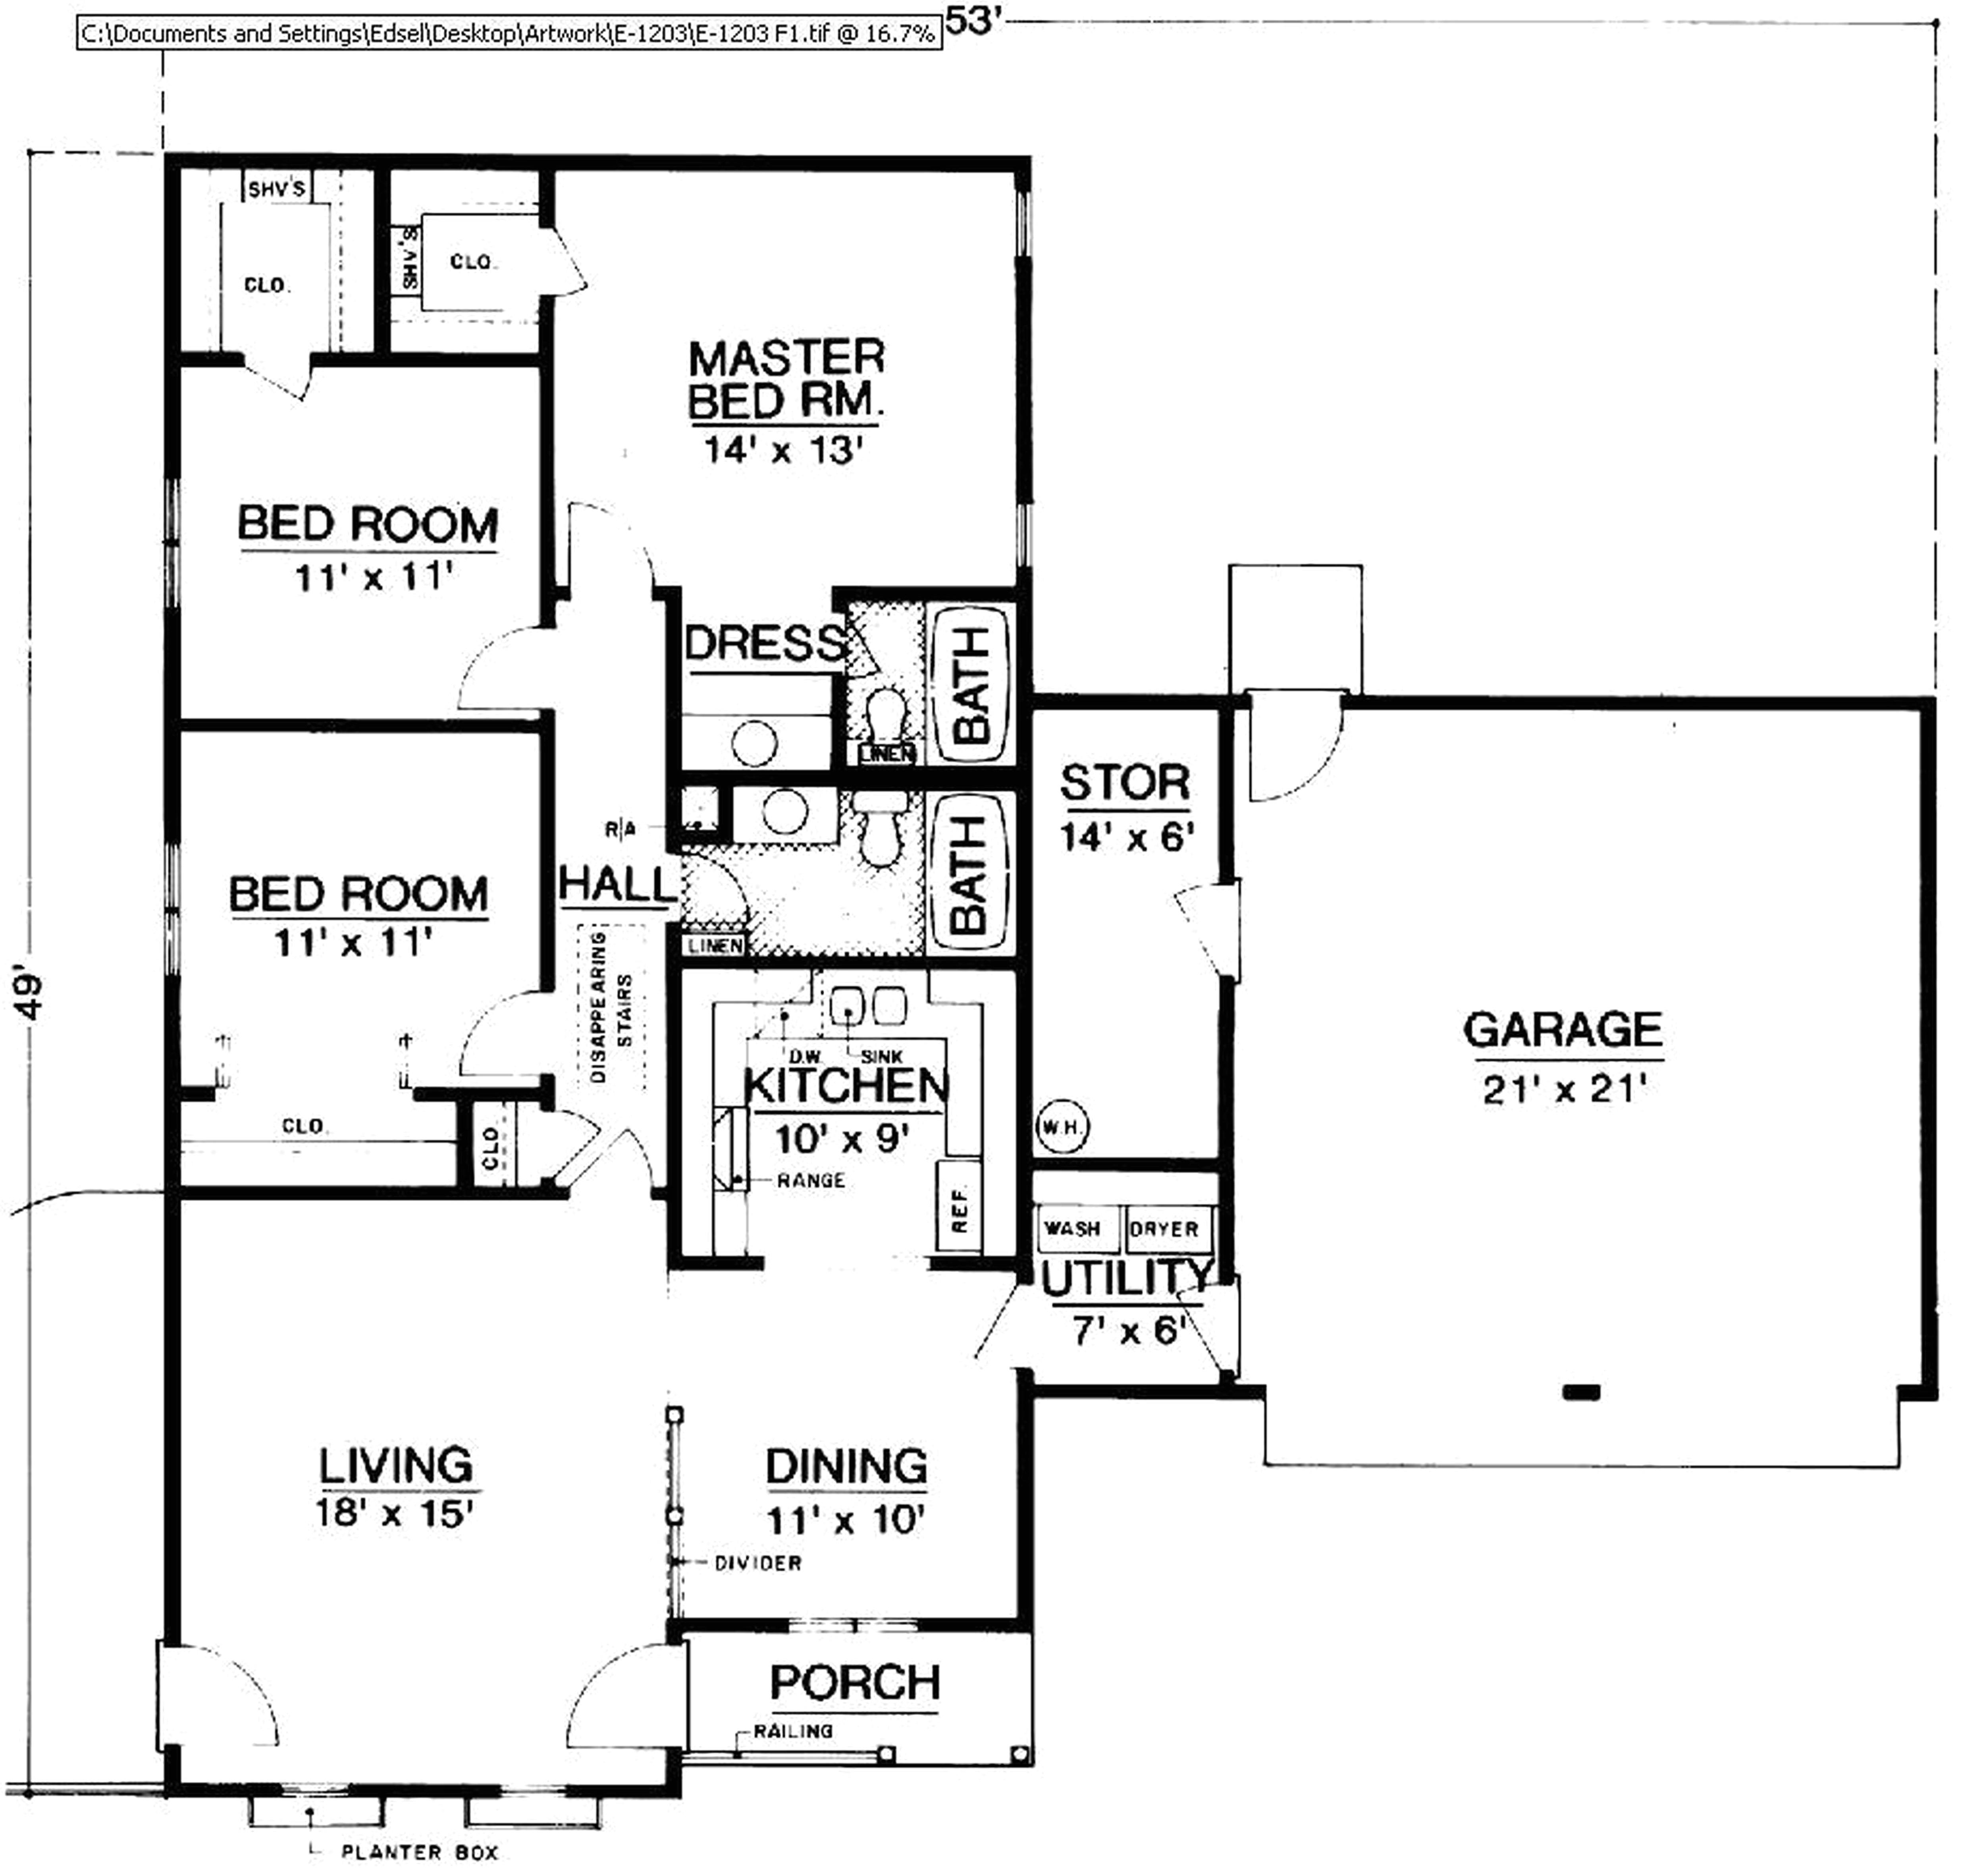 25 40 house plan india unique 20 x 40 floor plan house layout plans globalchinasummerschool of